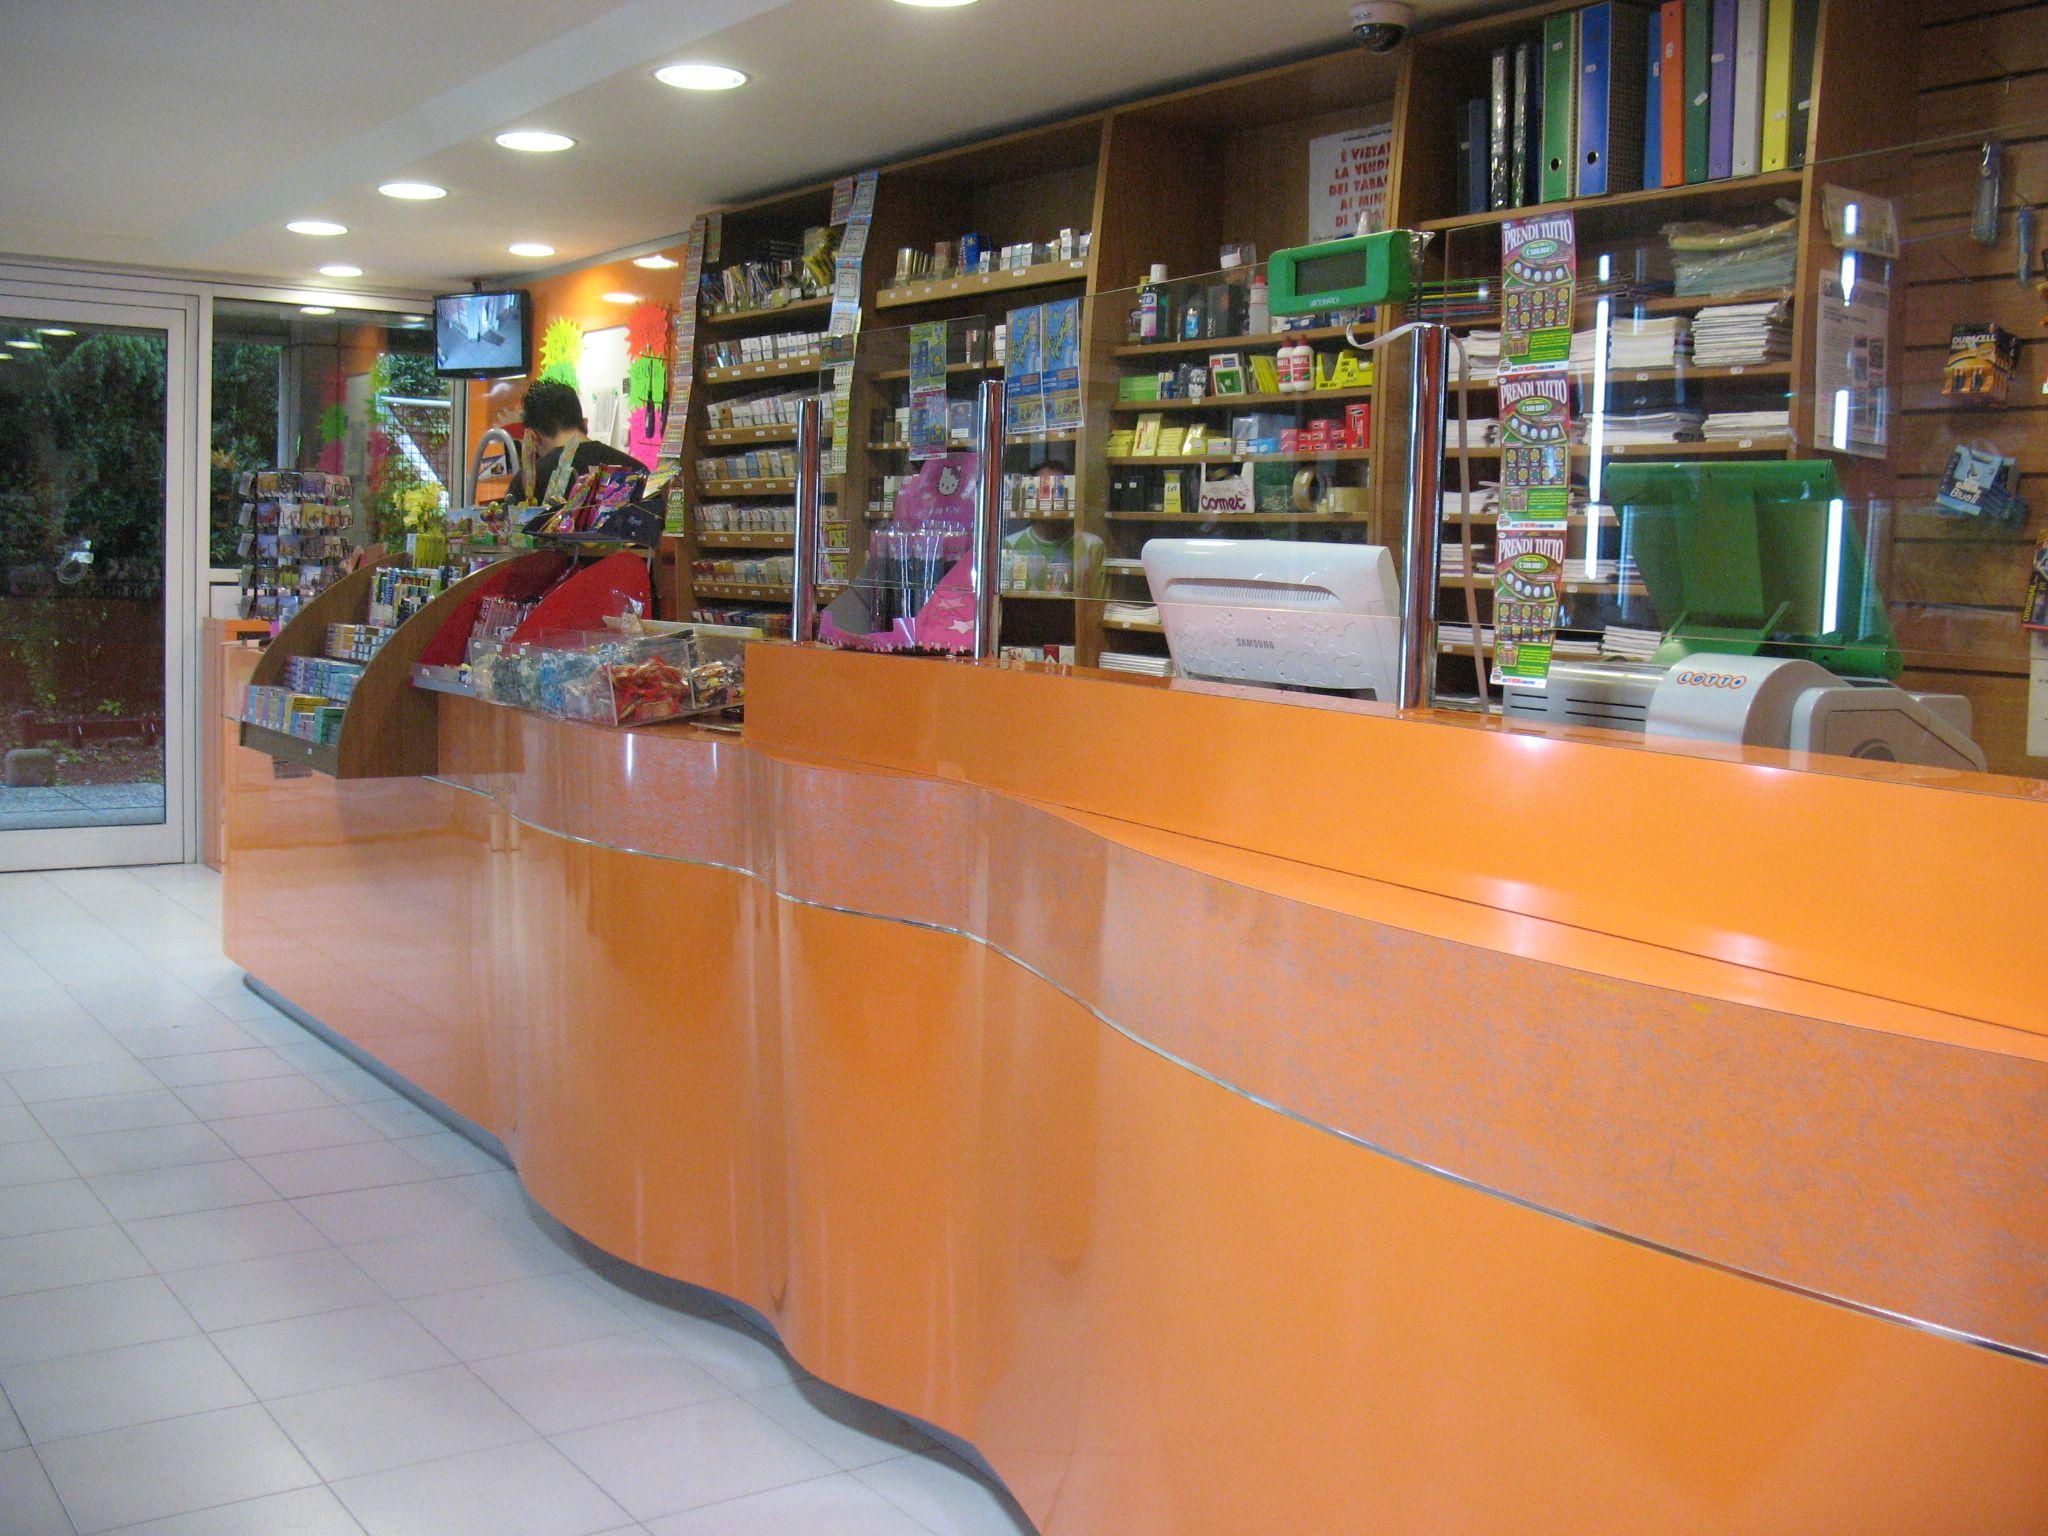 Arredamento Ricevitoria ~ Arredamento tabaccheria bar ricevitorie negozi aessearreda on